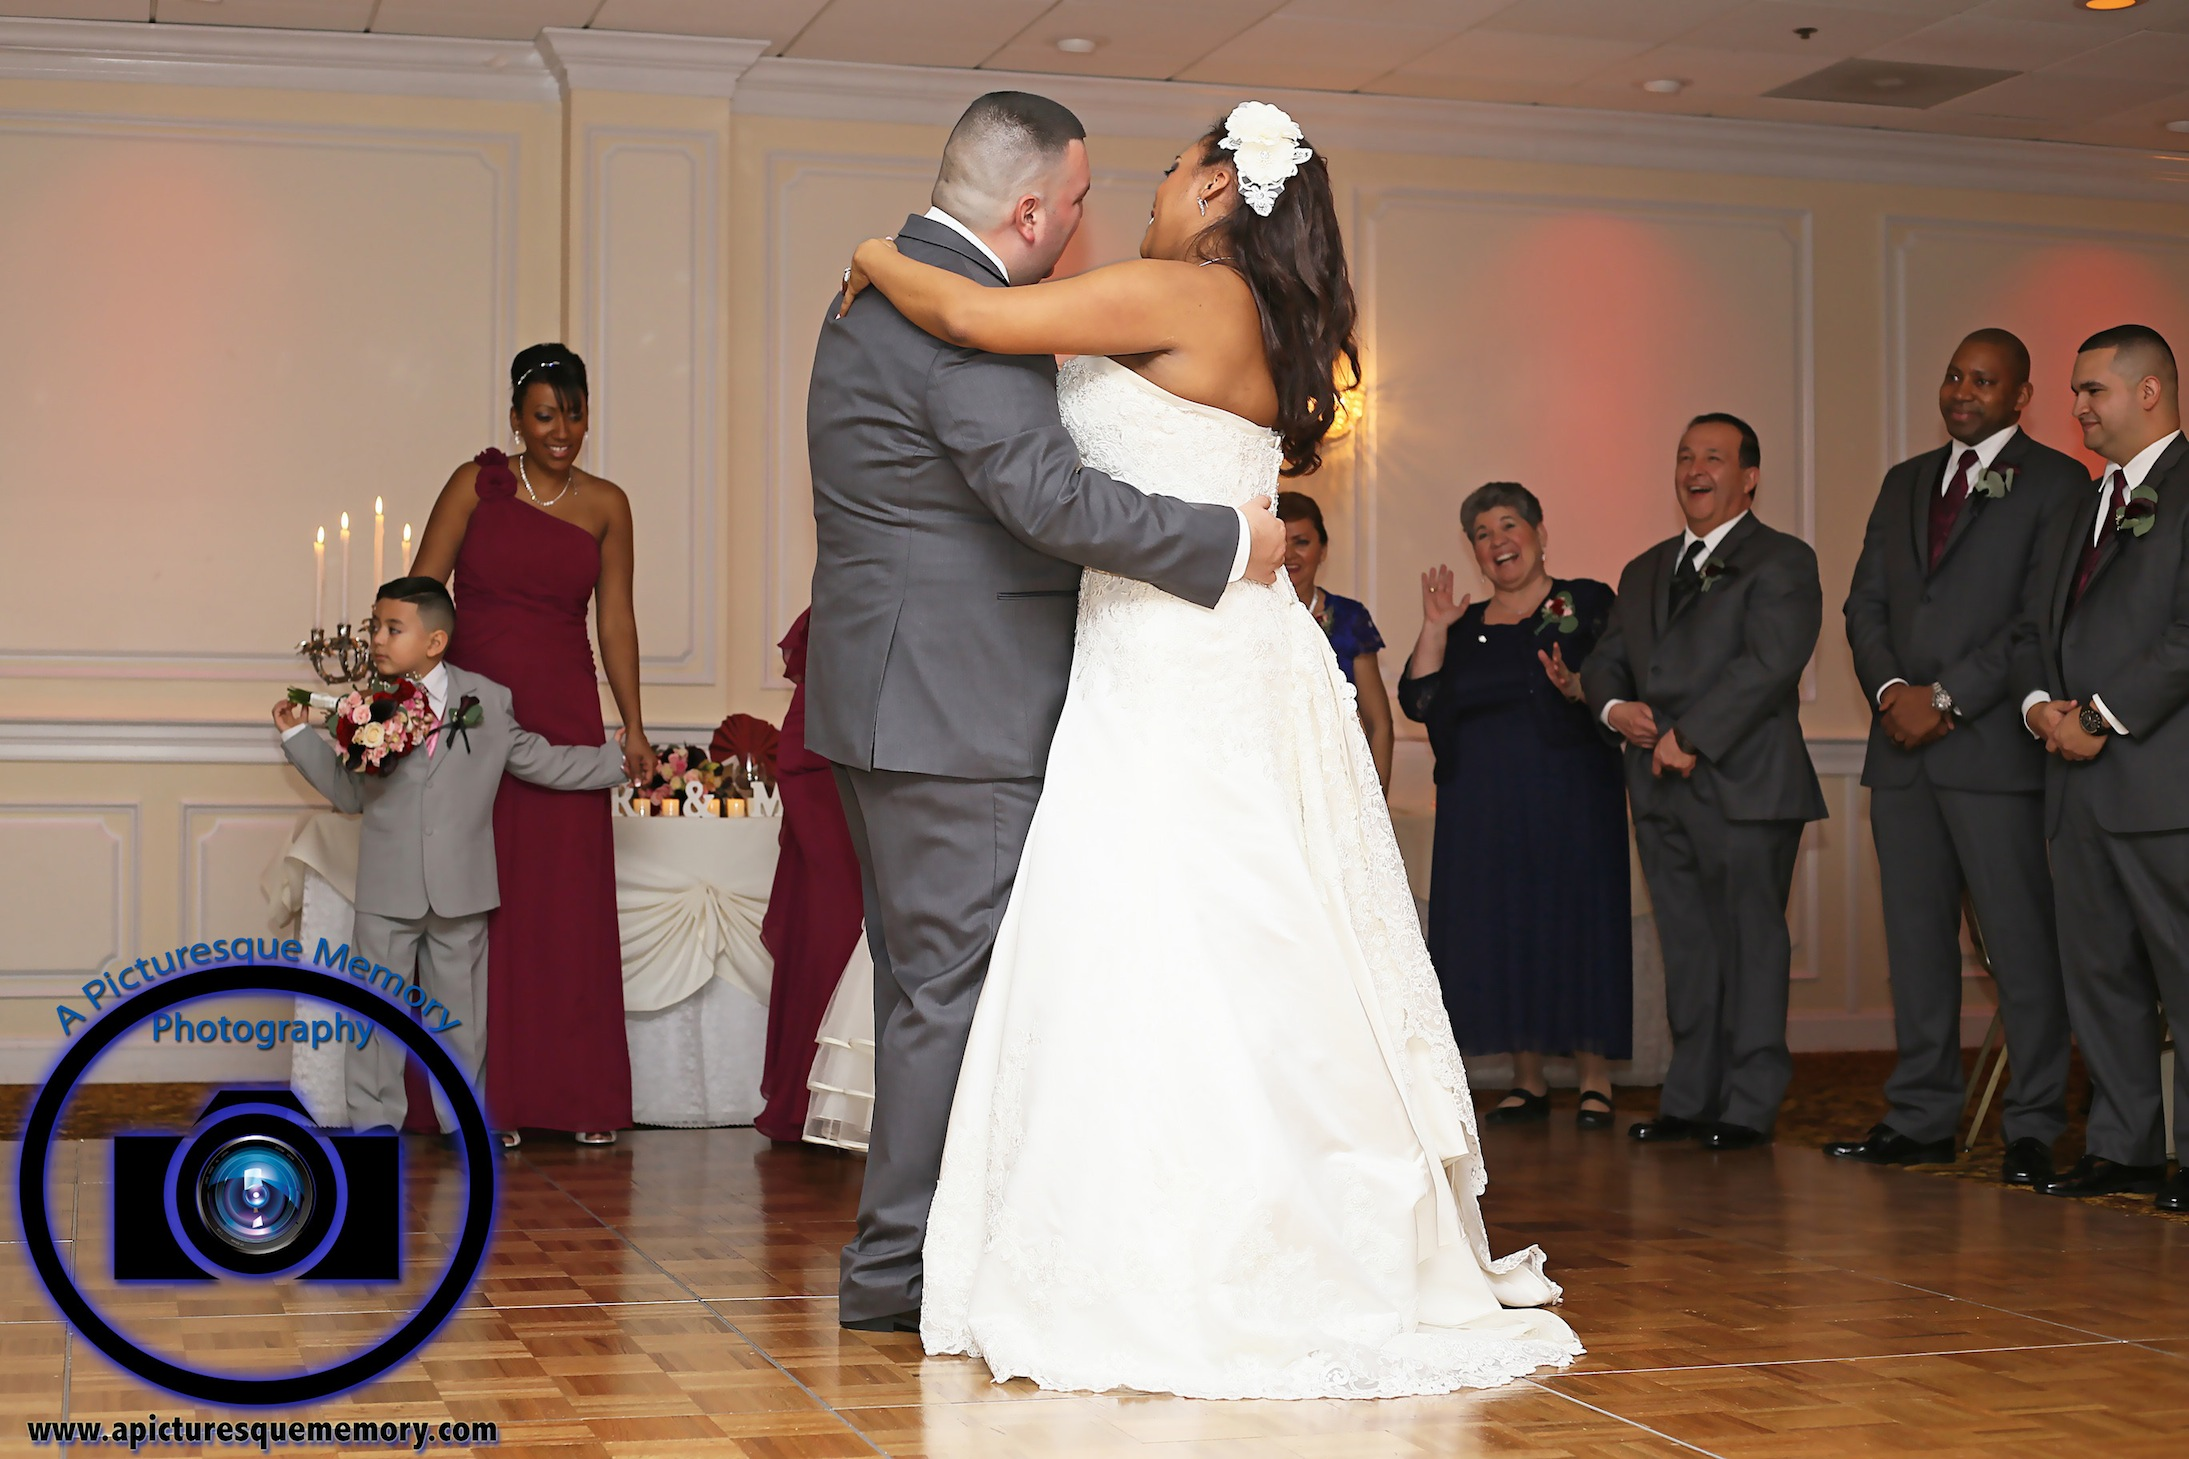 #njwedding, #njweddingphotography, #southbrunswickweddingphotographer#weddingphotos, #apicturesquememoryphotography, #pierresofsouthbrunswickweddingphotographer, #brideandgroomfirstdance